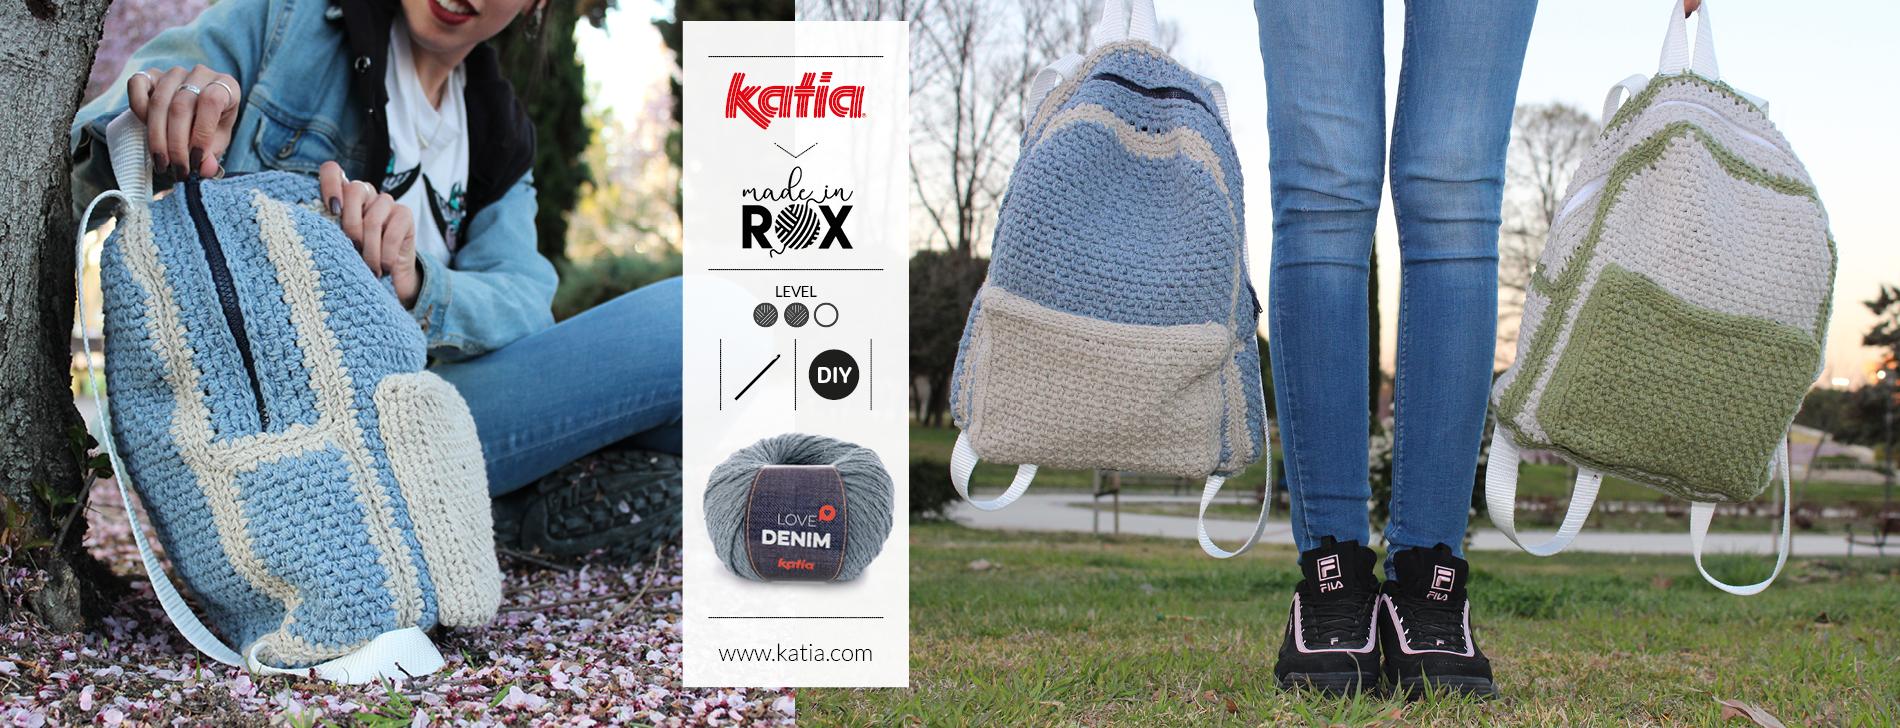 gehäkelter-rucksack-anleitung-madeinrox-slide